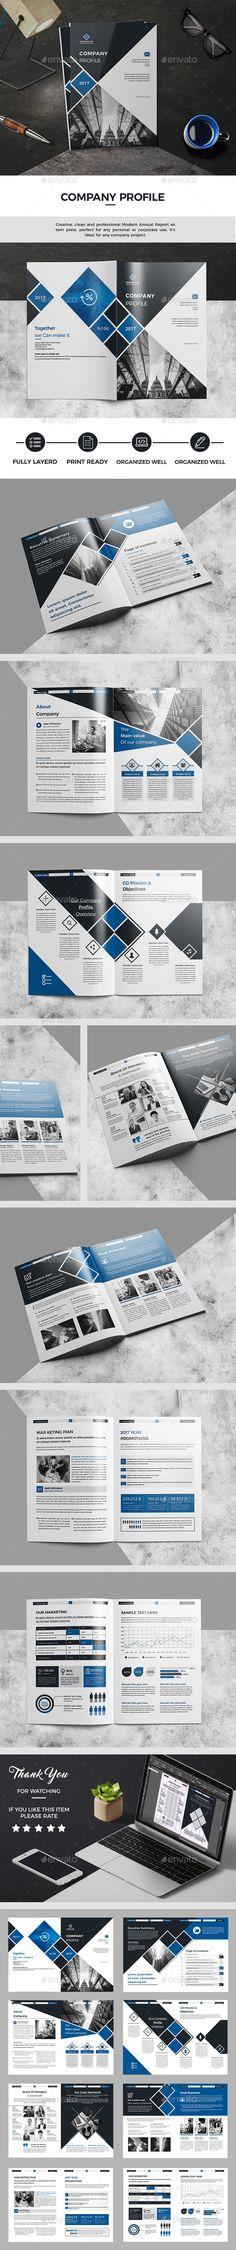 Company Profile — InDesign INDD #brief #visual • Download ➝ https://graphicriver.net/item/company-profile/19269699?ref=pxcr